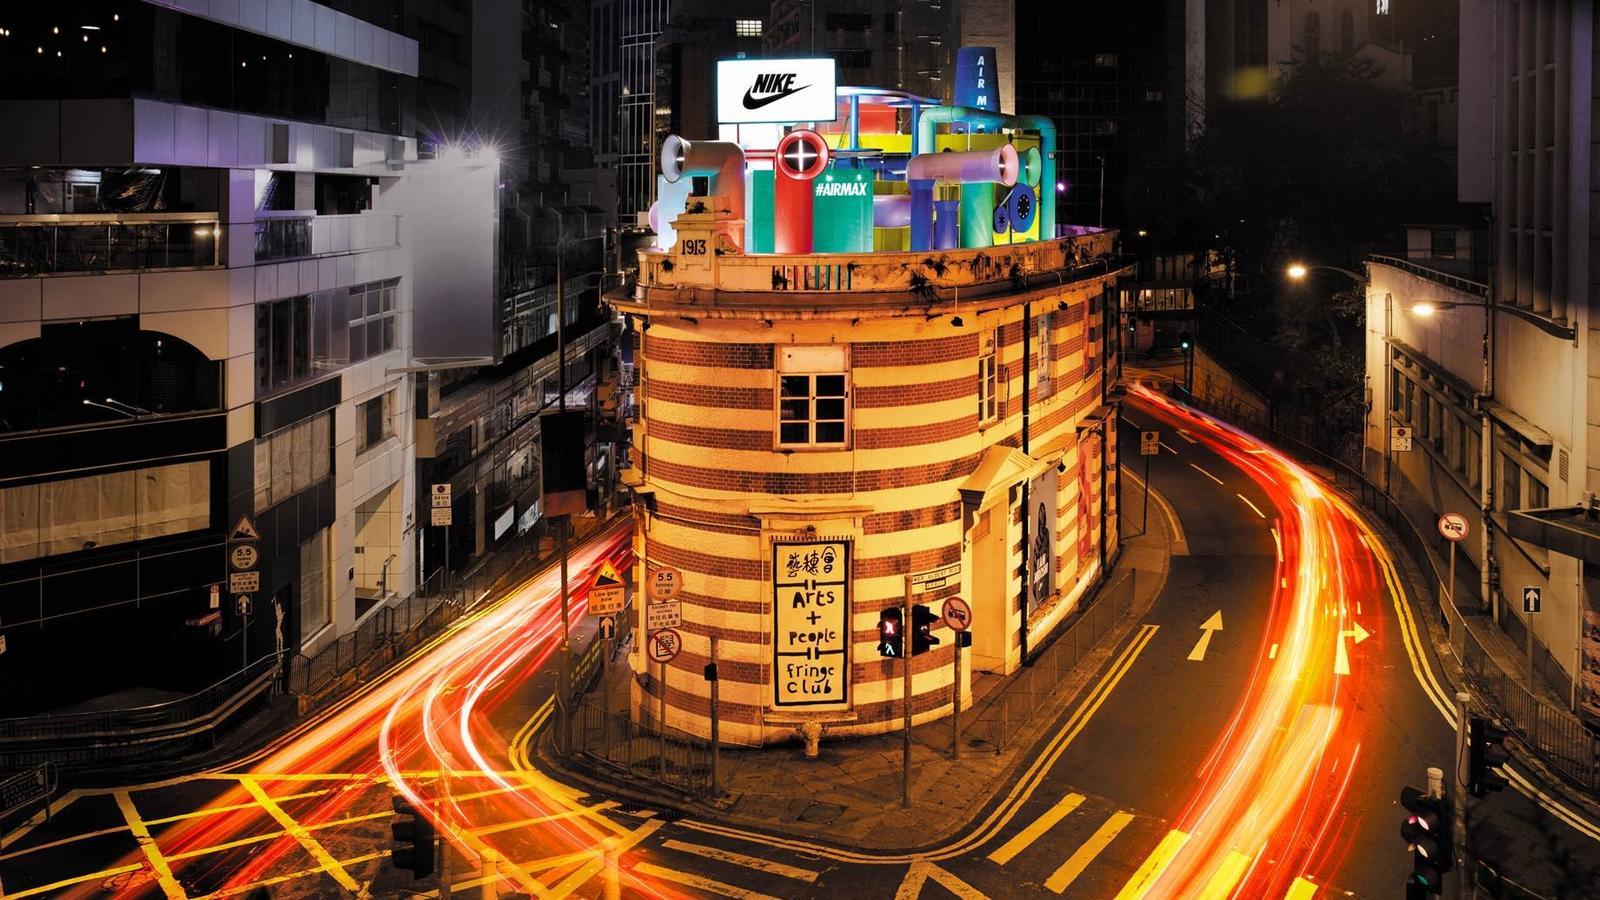 bb1e113dbd ... nike air max day f5927 67fba; uk air max con to debut in hong kong  tokyo and new york city 7e175 b06f3